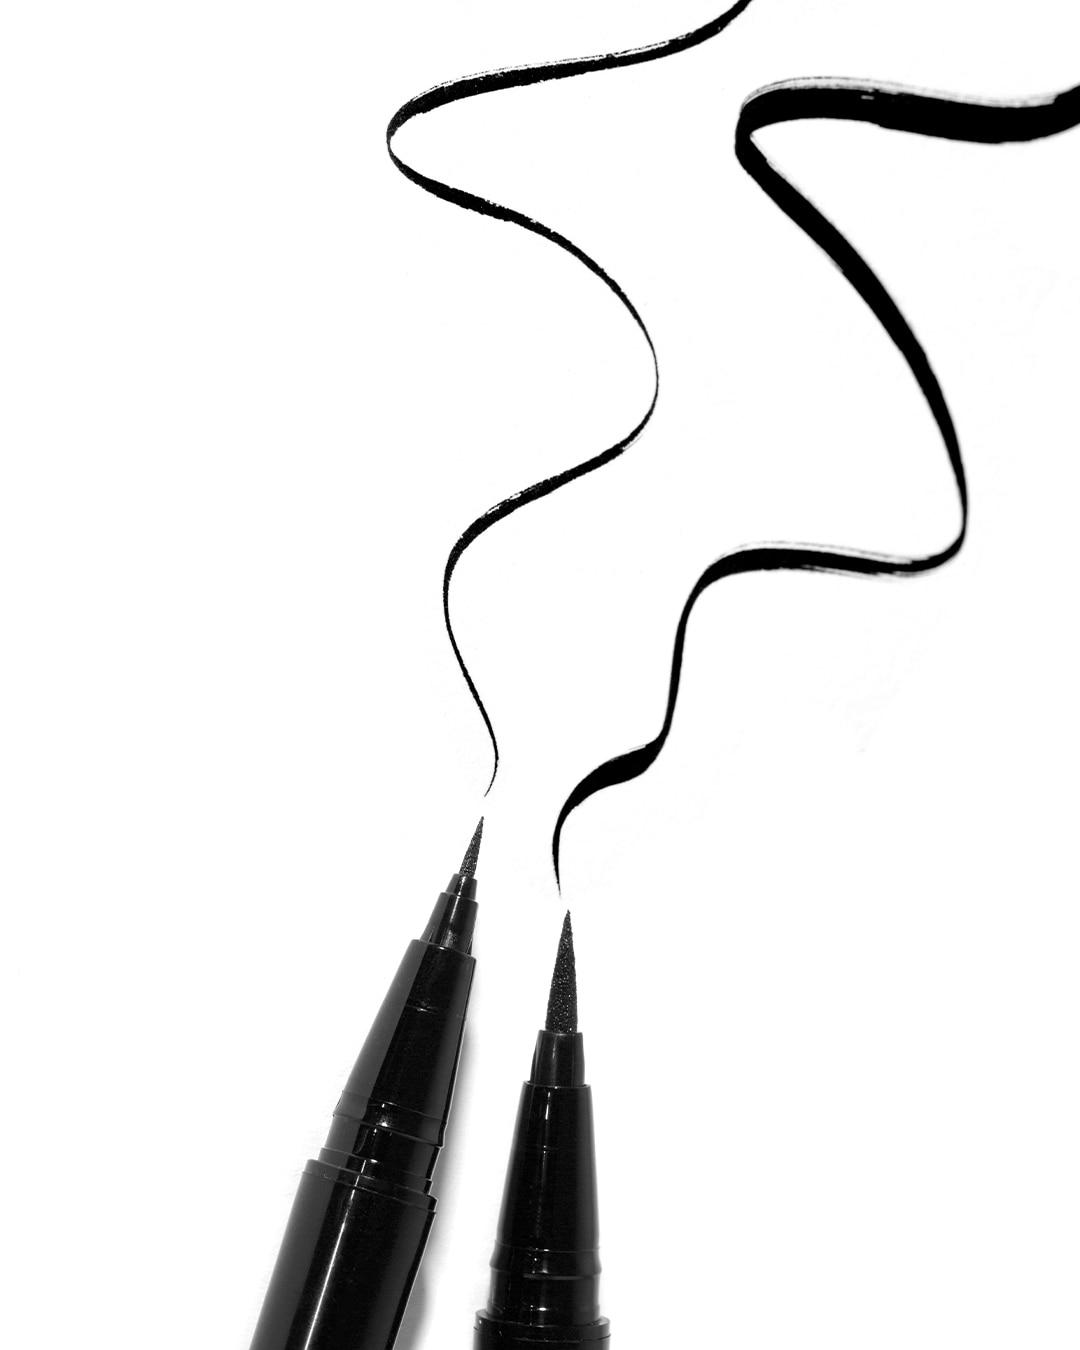 STAY ALL DAY WATERPROOF LIQUID EYE LINER- MICRO TIP